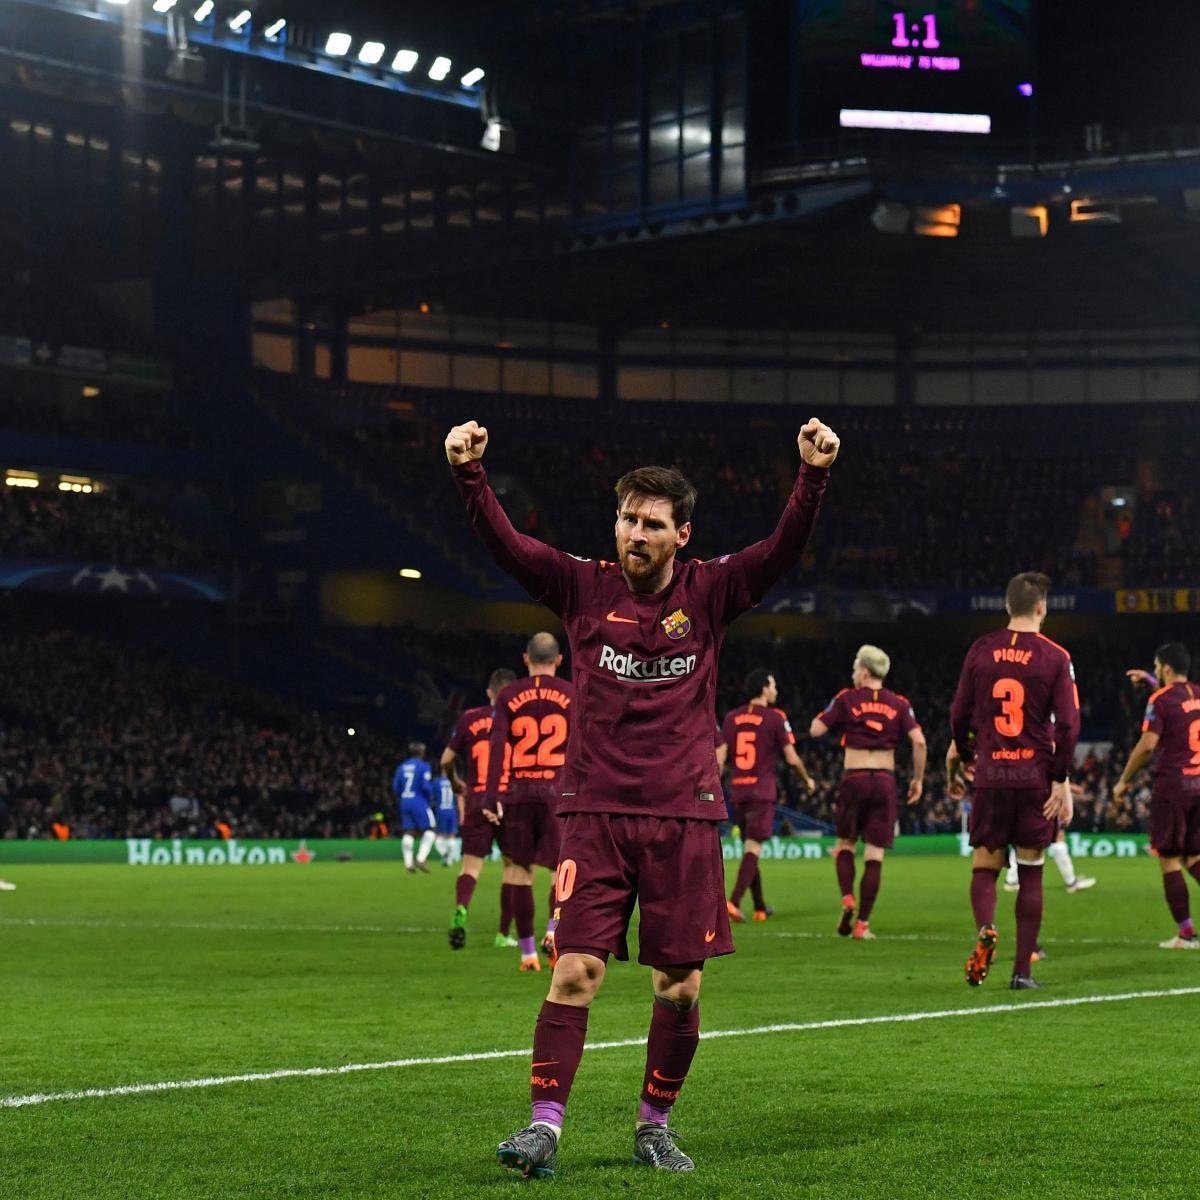 Champions League 2019 Round Of 16 Leg 2 Live Stream Tv: Champions League 2018: Round-of-16 Live Stream, TV Info